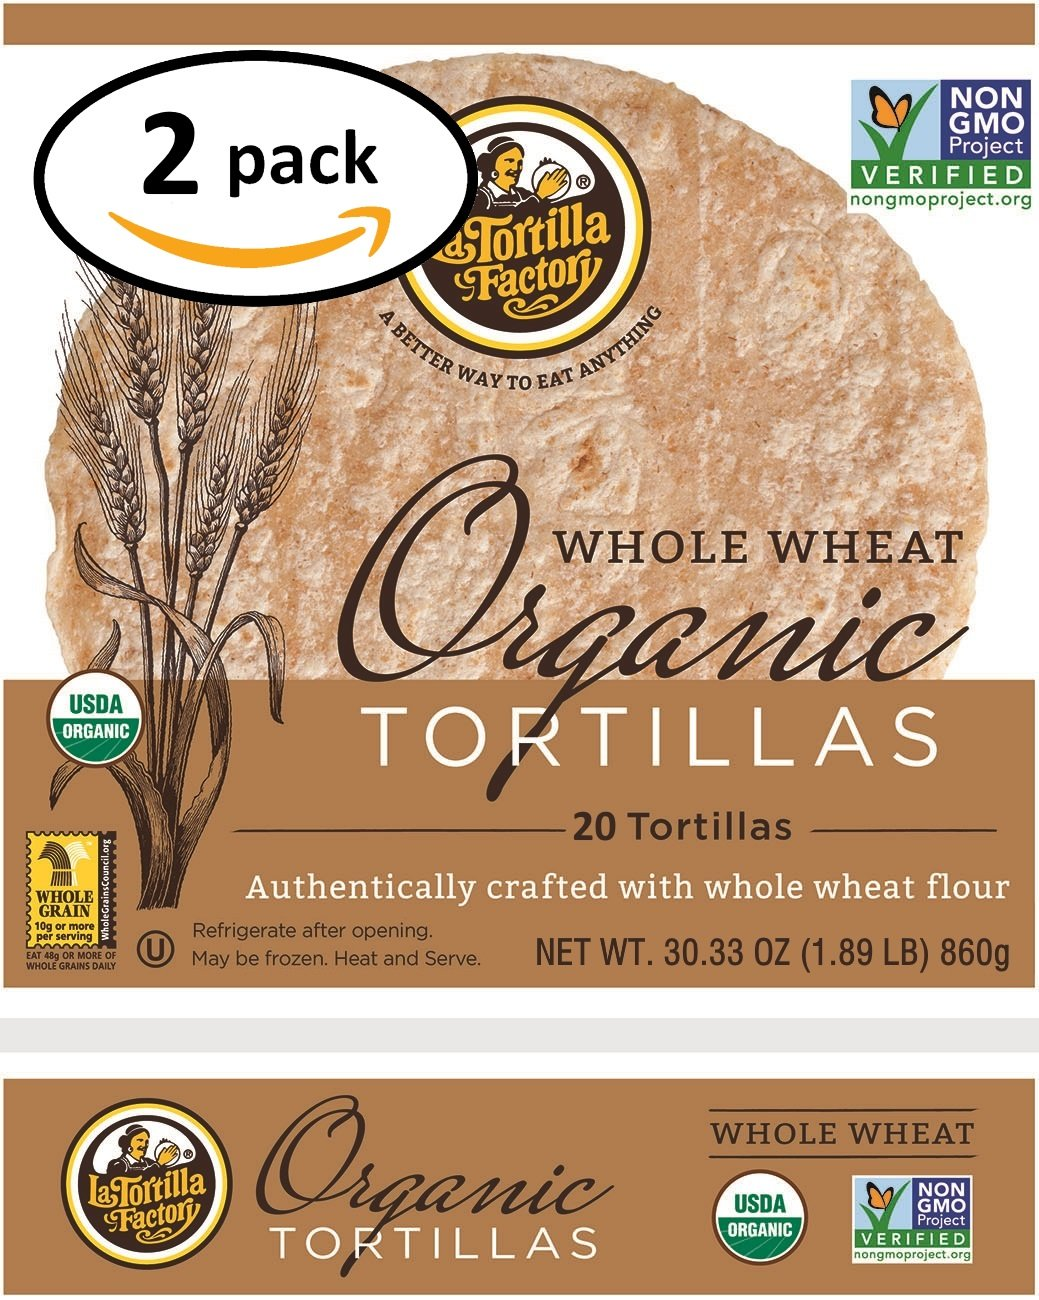 Organic Whole Wheat Tortillas 2-Pack (40 Tortillas)